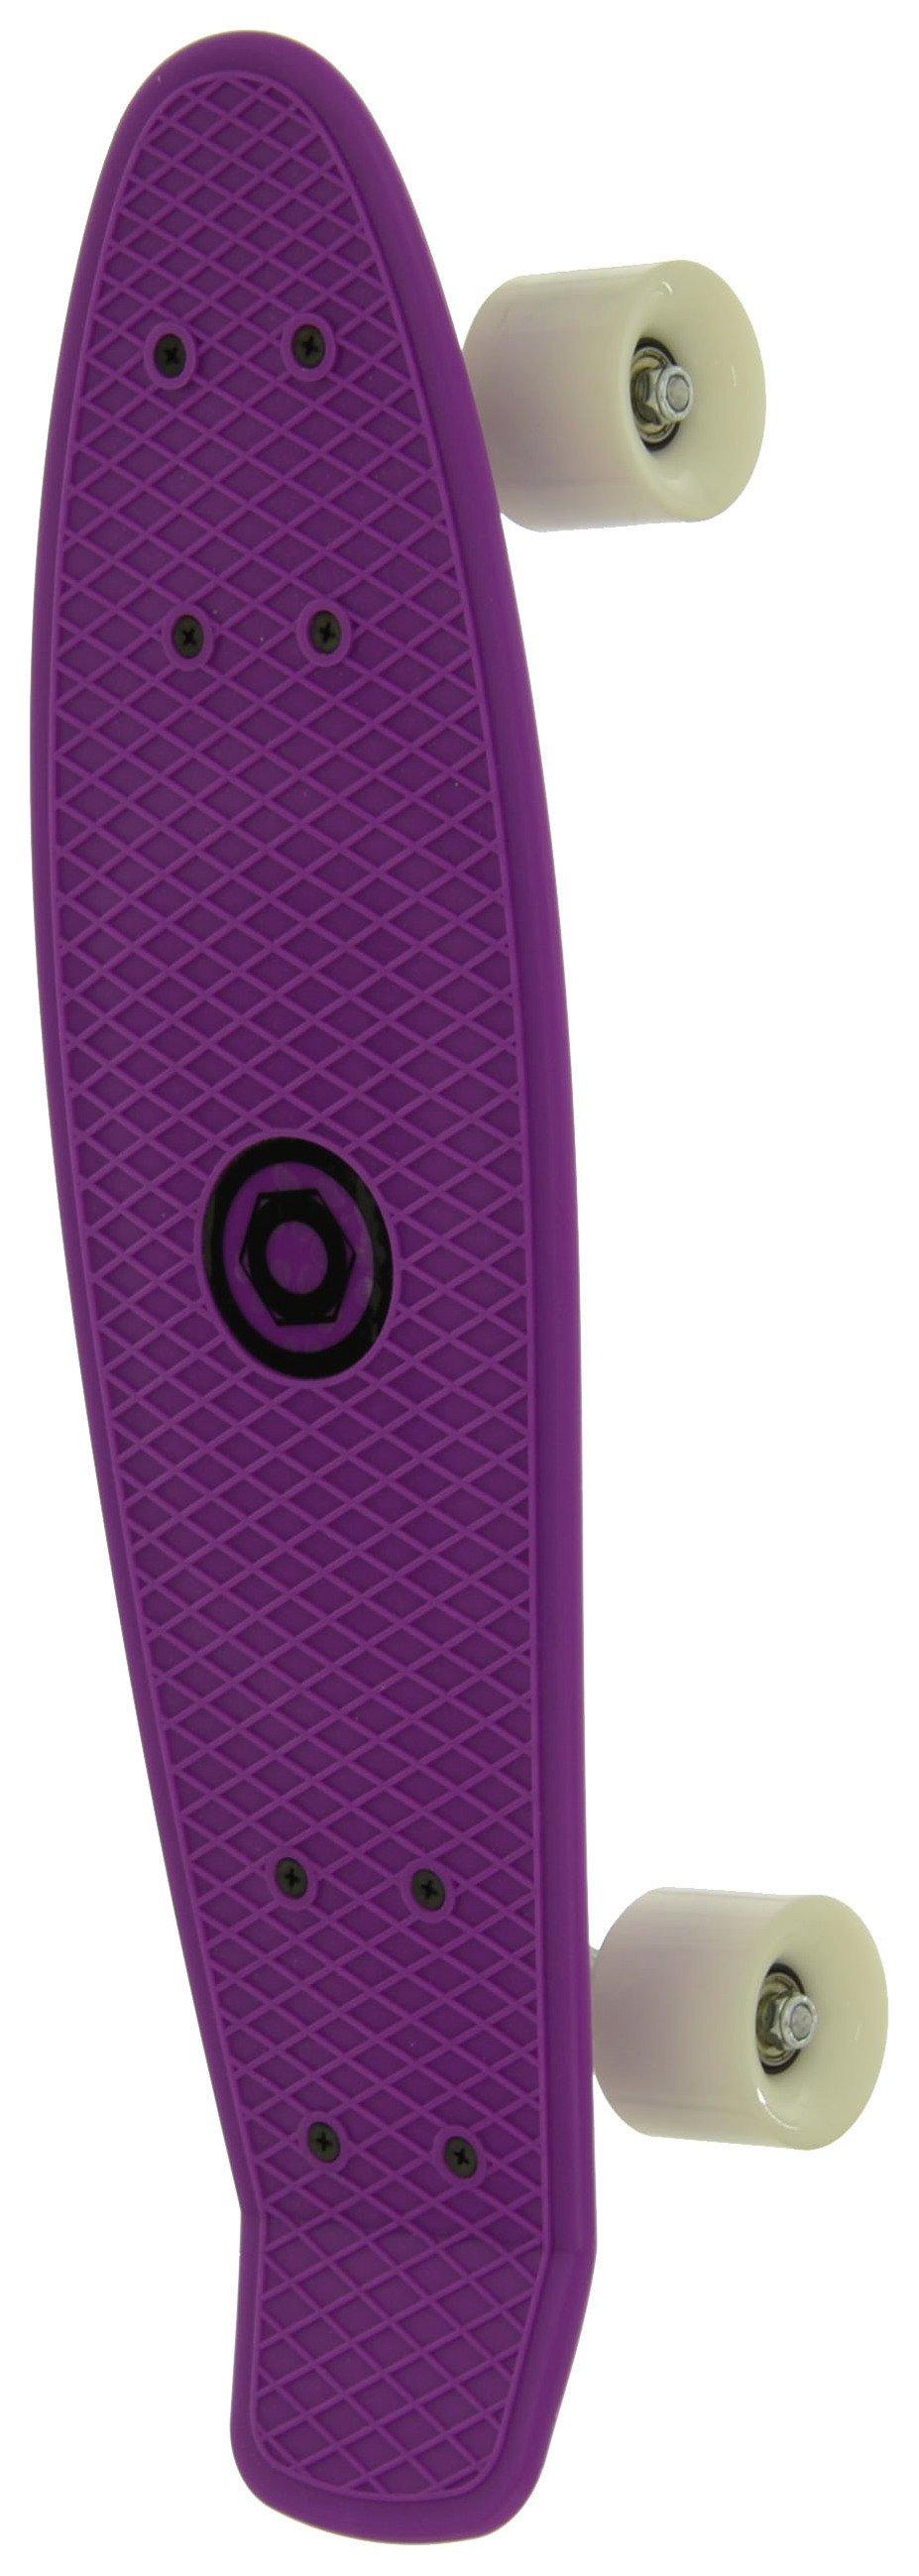 Image of Bored - Neon XT Cruiser Skateboard - Purple